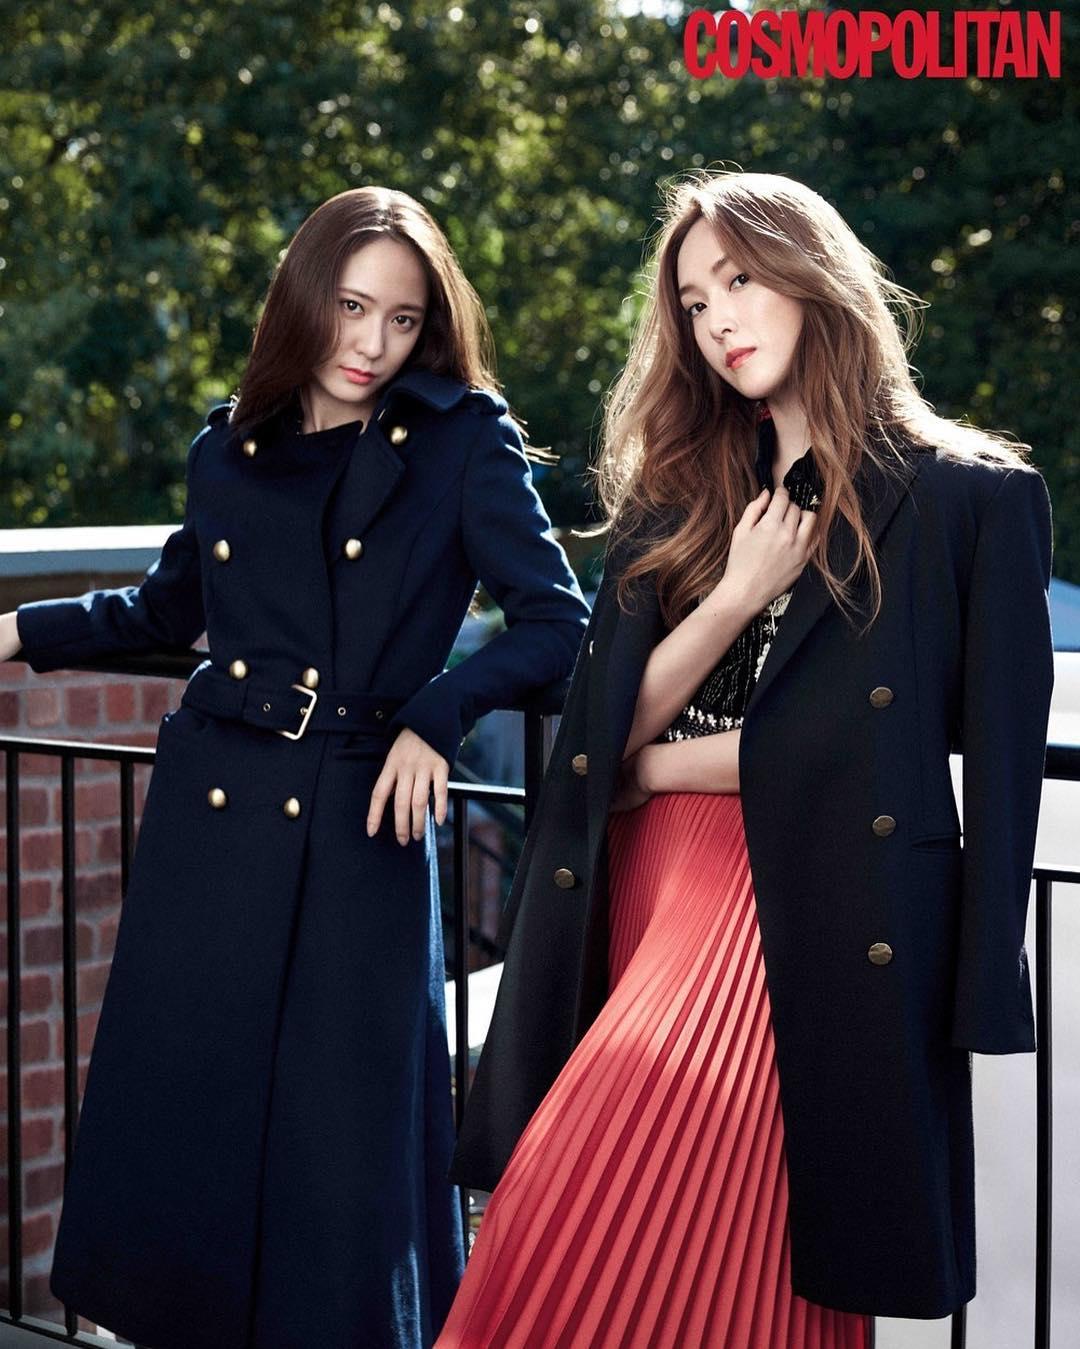 Jessica and Krystal Cosmopolitan